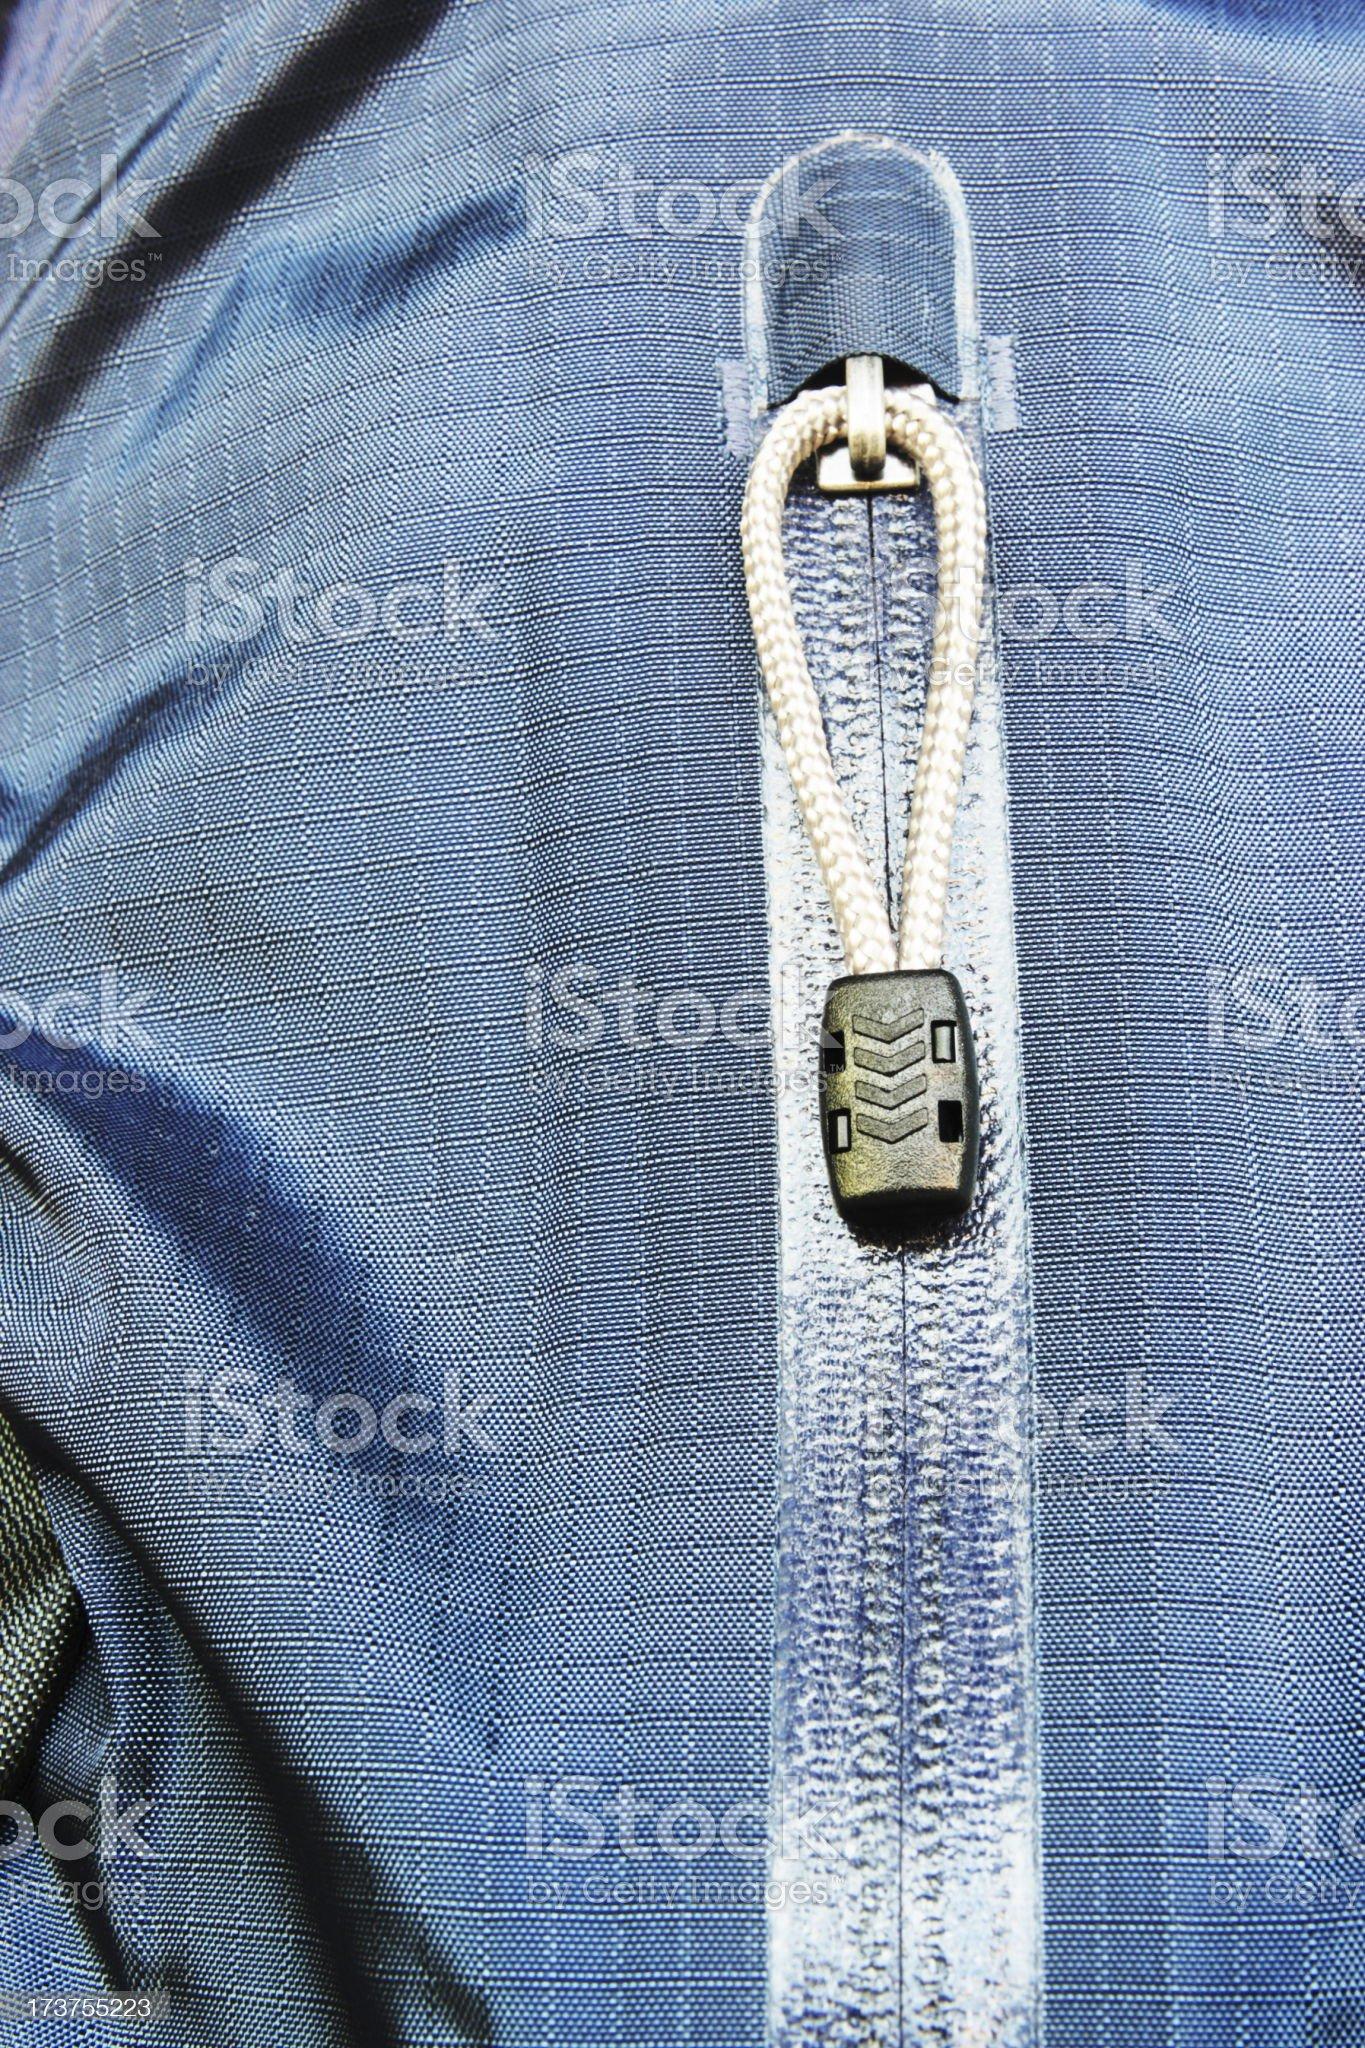 Zipper Pocket Jacket Fashion royalty-free stock photo